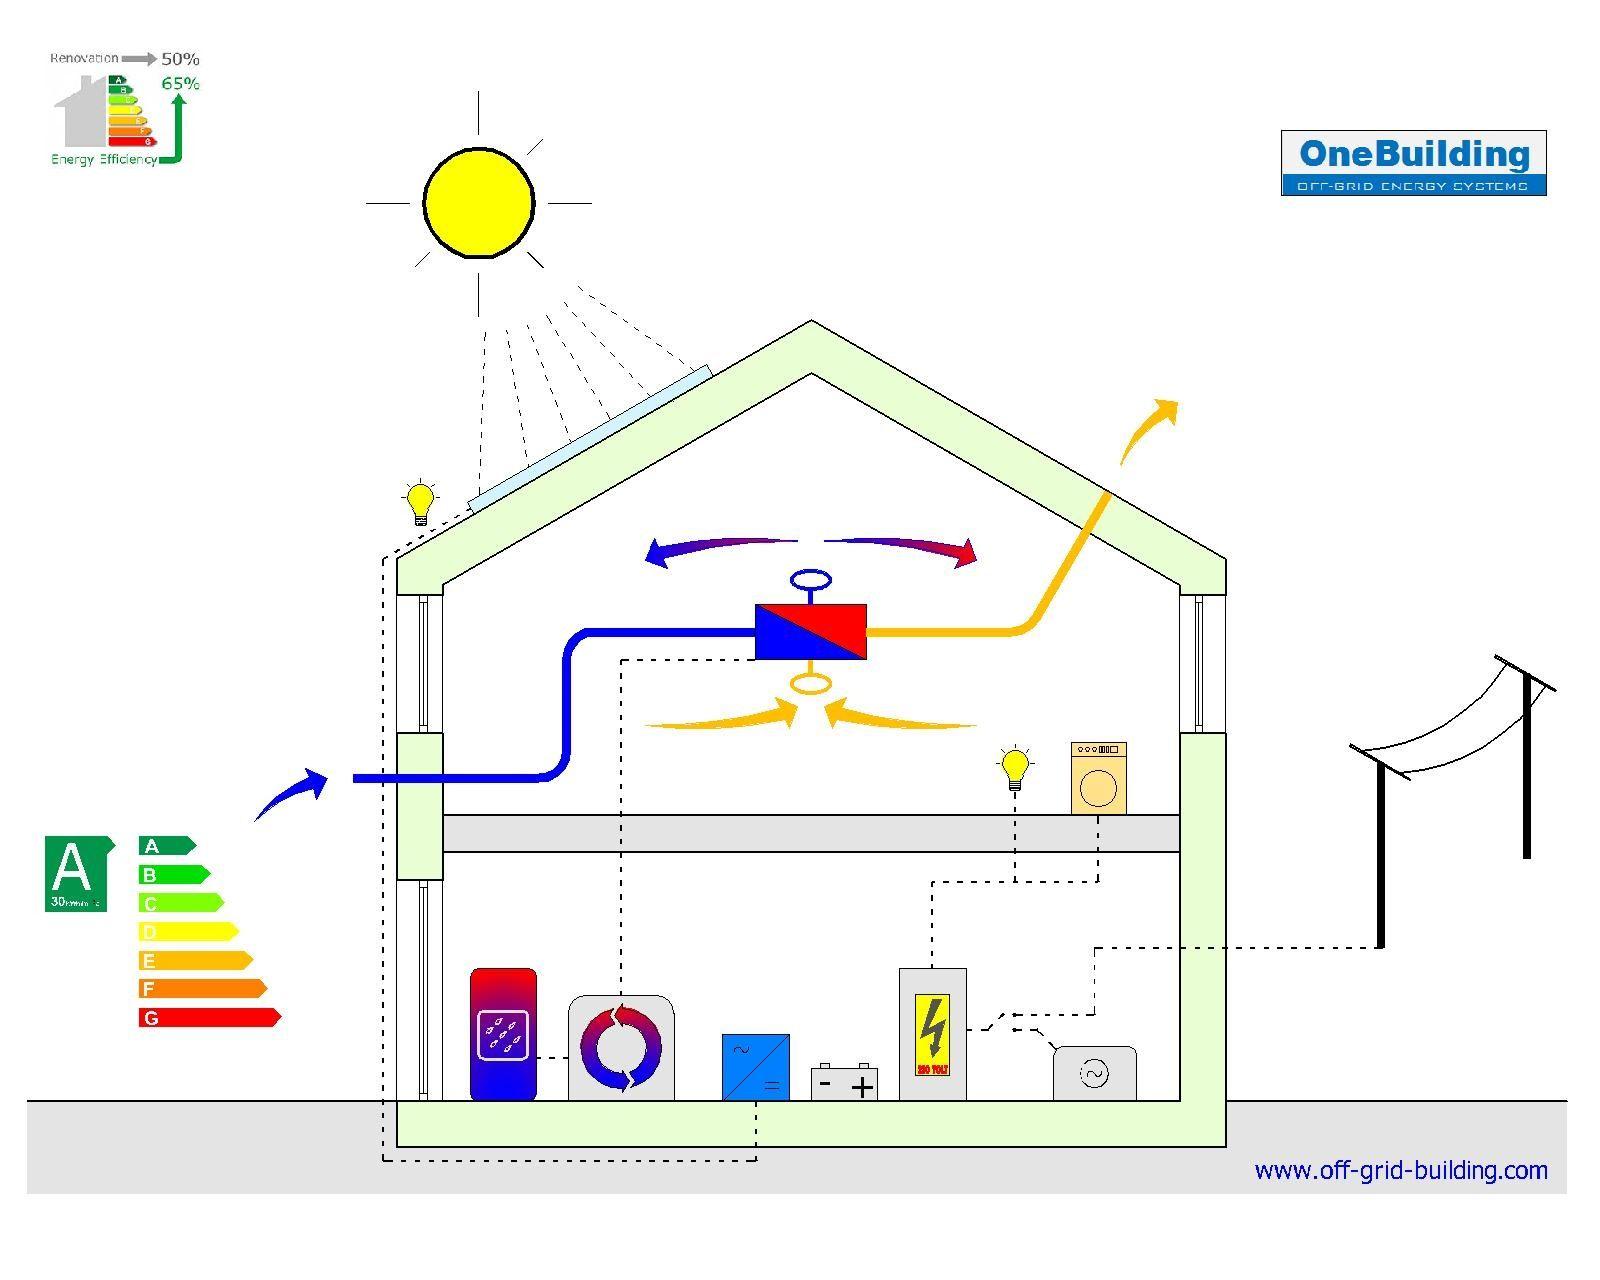 Solar Farm design scheme of an energy efficient class A off grid